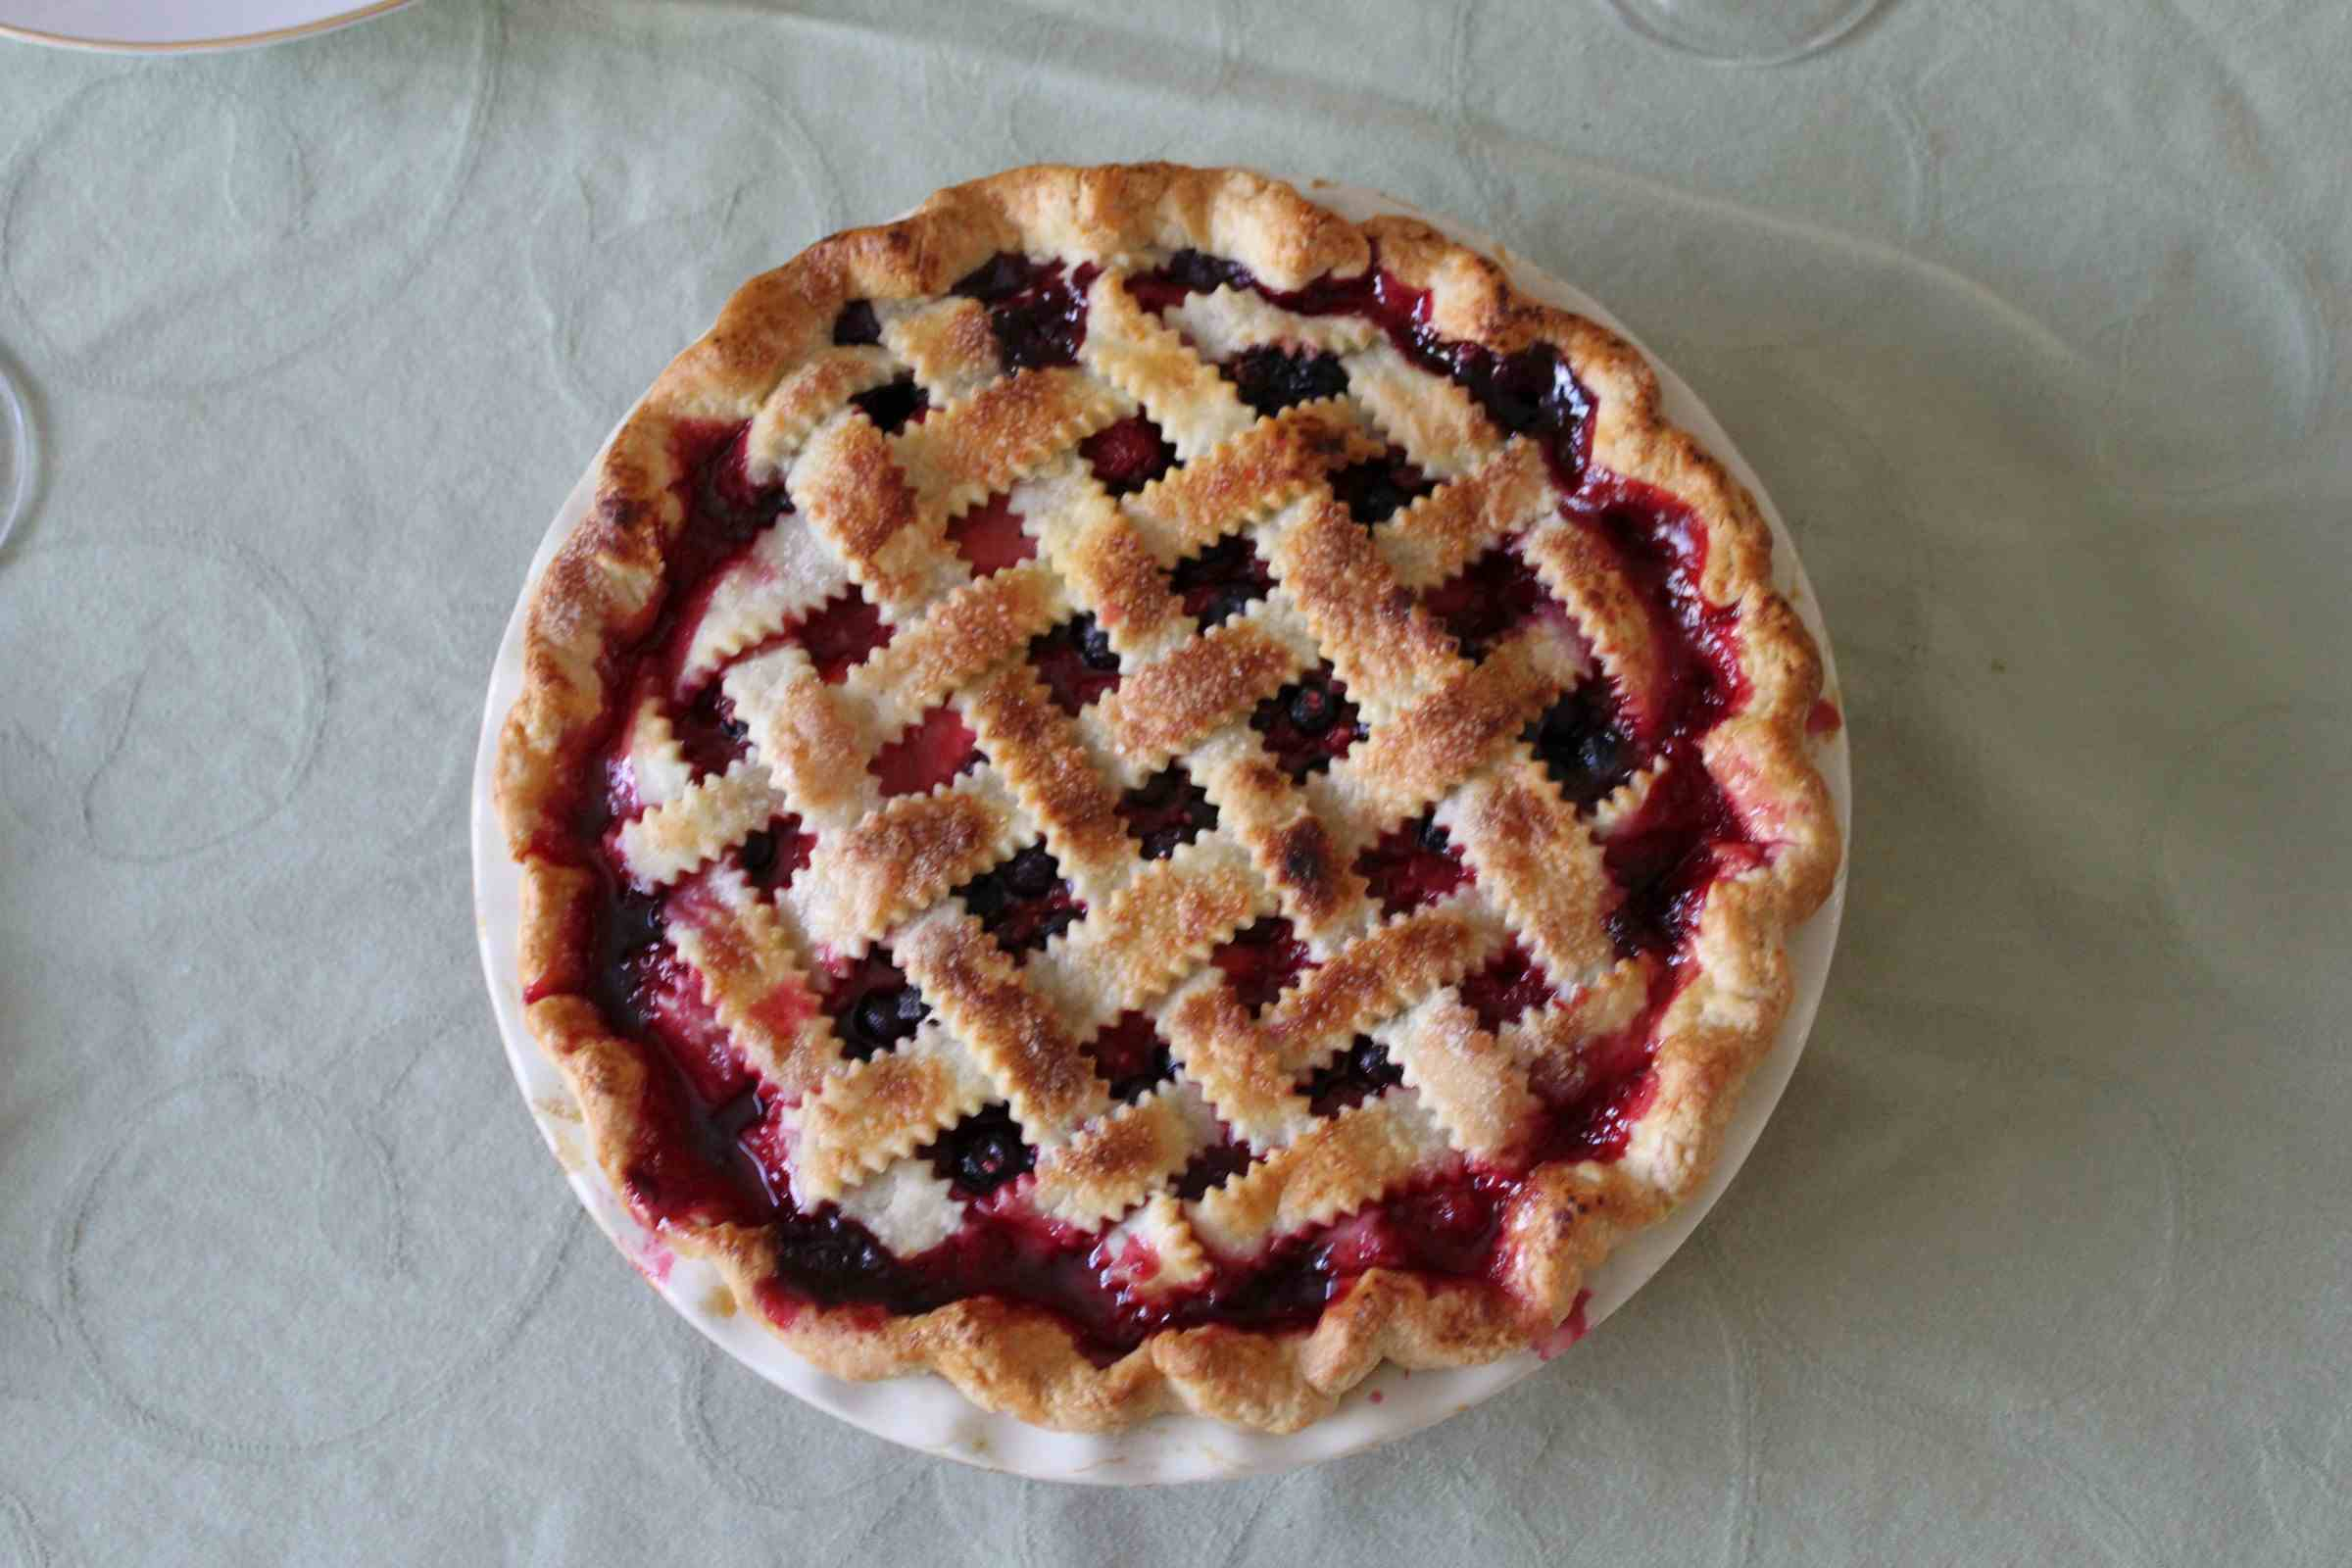 Mustikkapiirakka or blueberry pie.